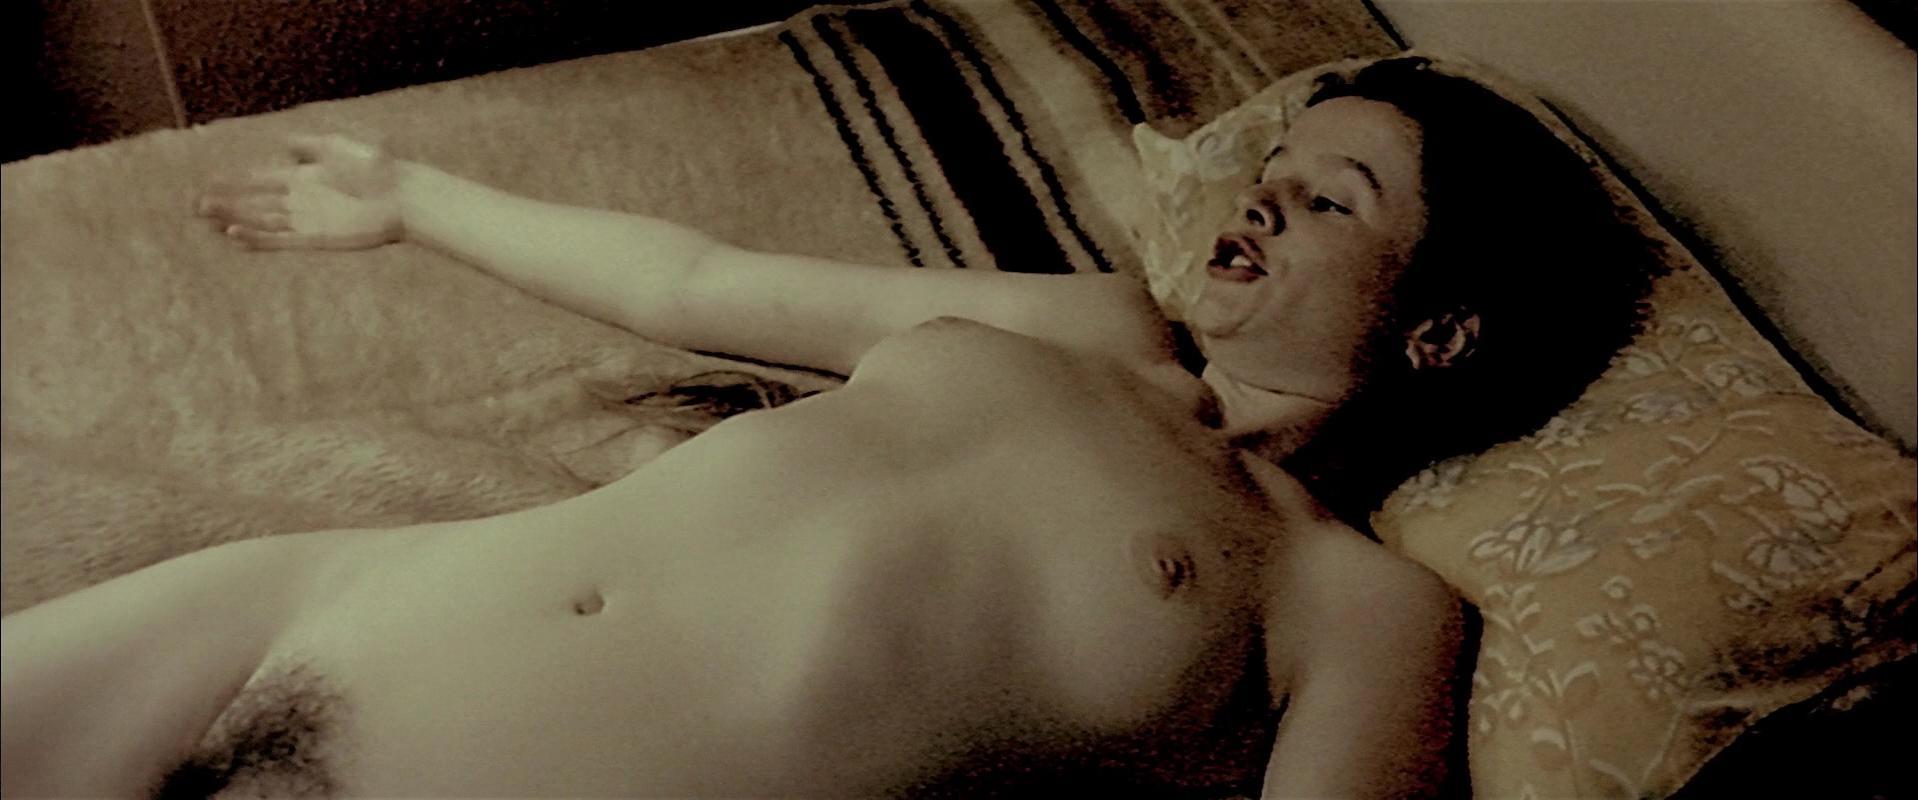 Emily watson nude sex